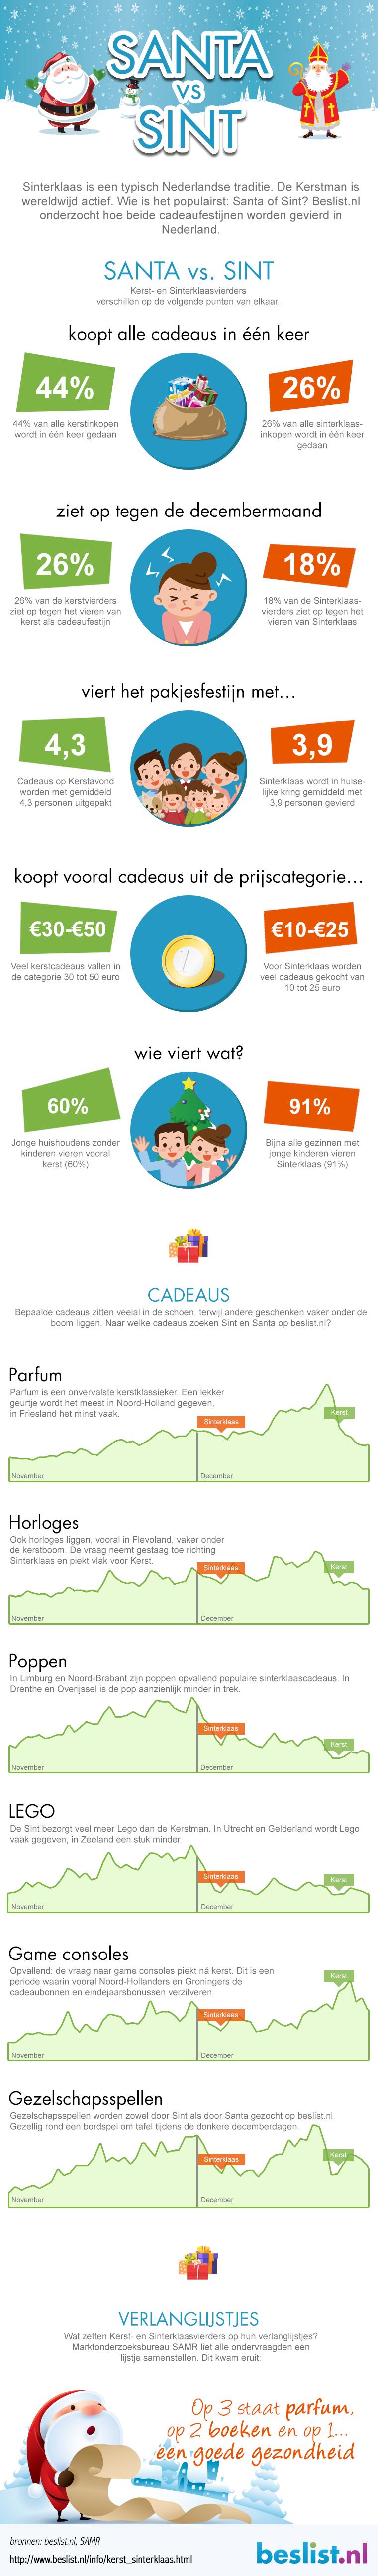 Infographic Santa vs Sint